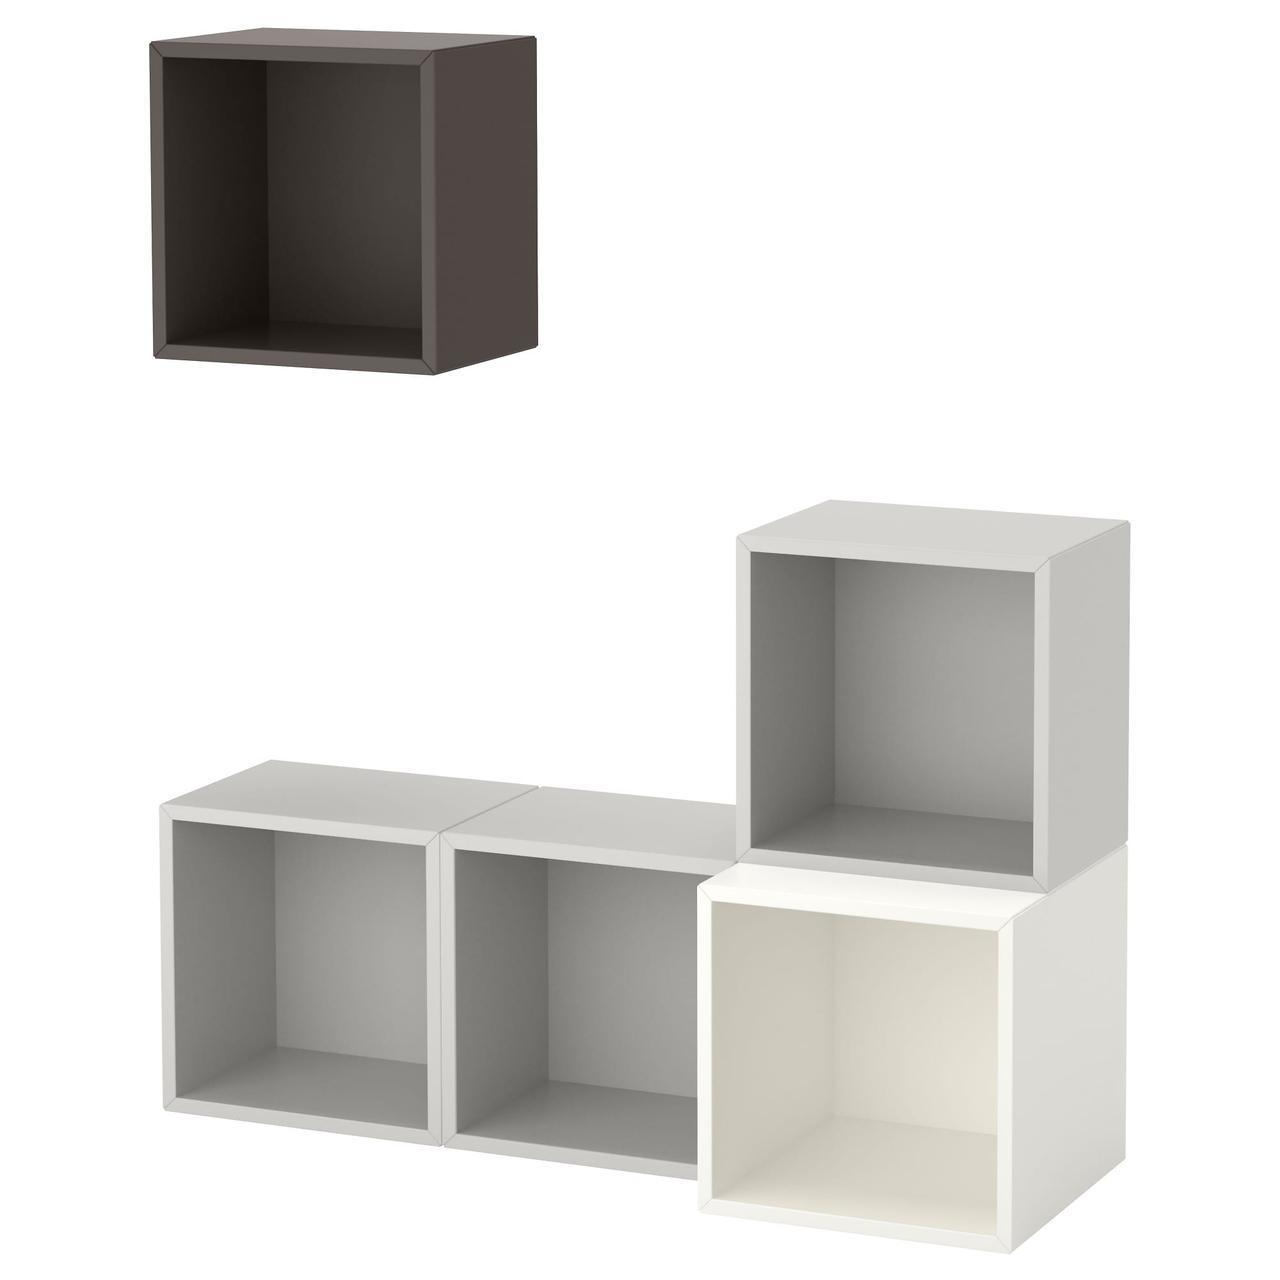 IKEA EKET (291.891.19) Комбинация настенных шкафов, разноцветных